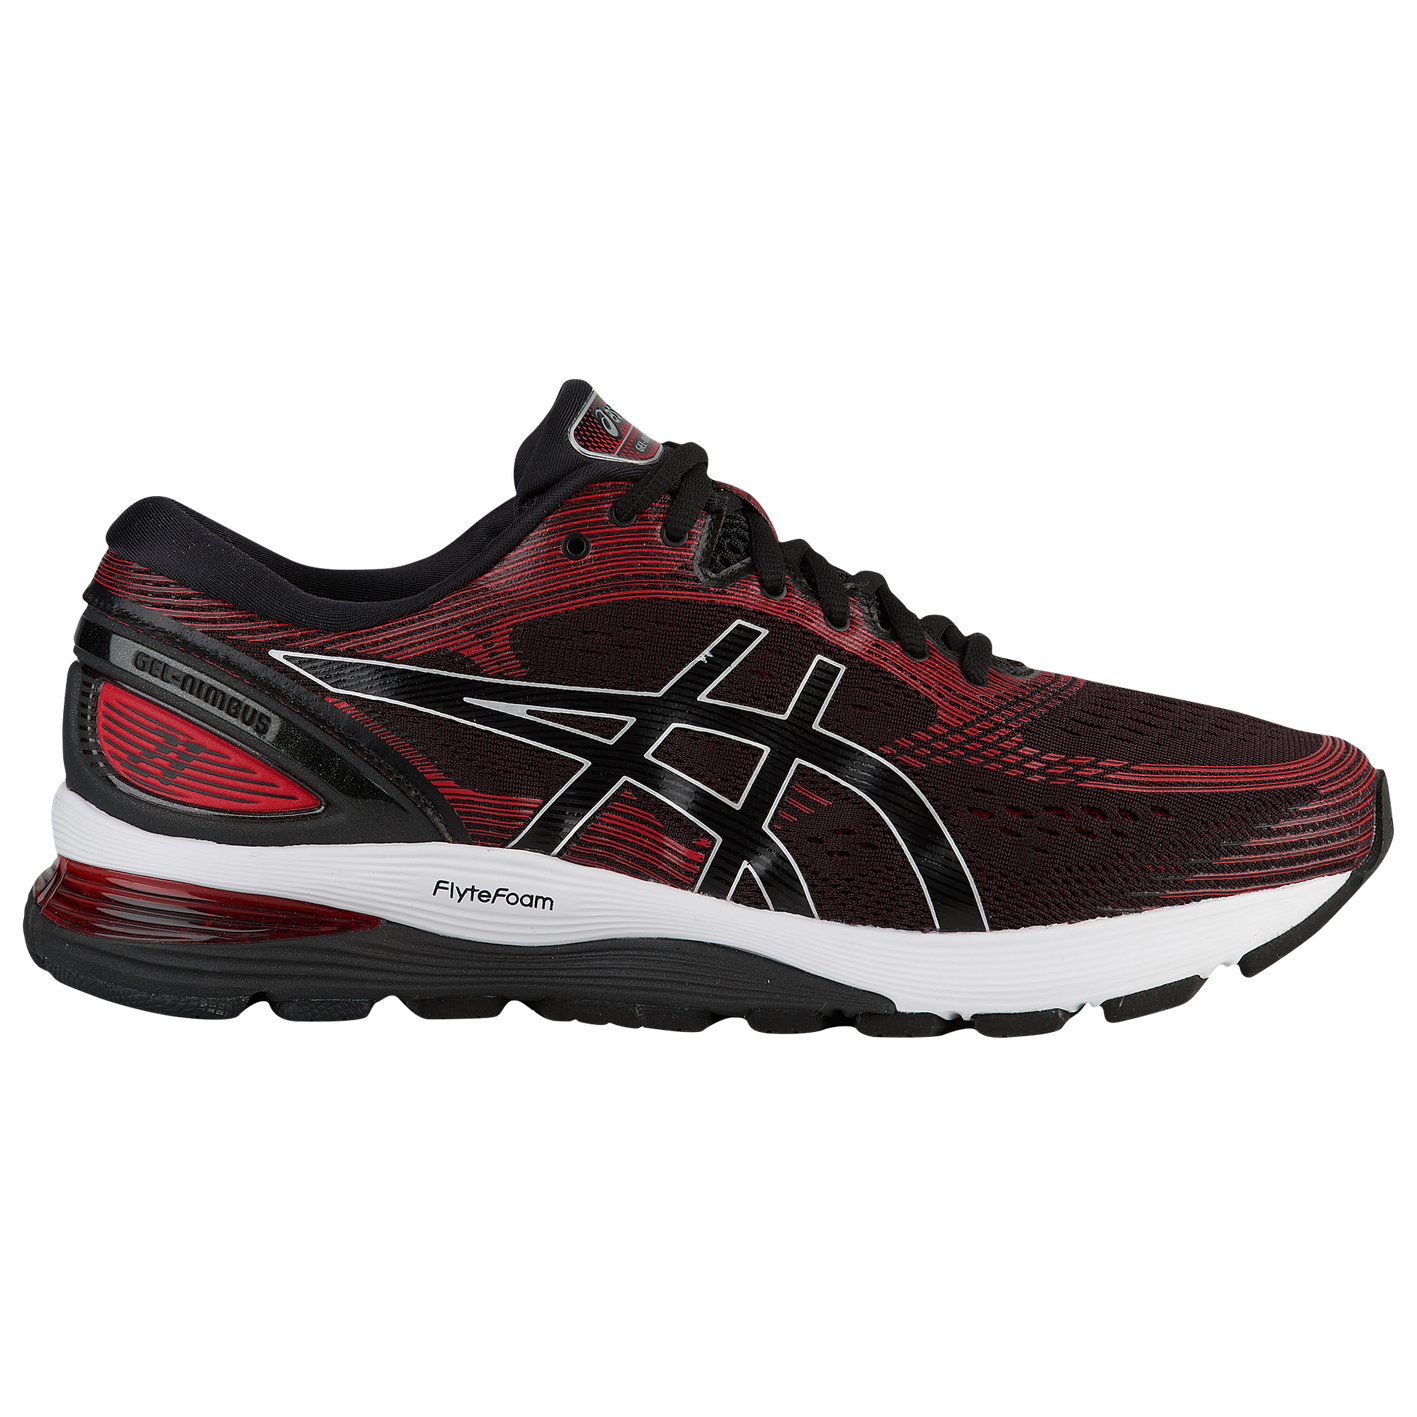 a6f5053dc37 ASICS® GEL-Nimbus 21 - Men s - Running - Shoes - Black Classic Red